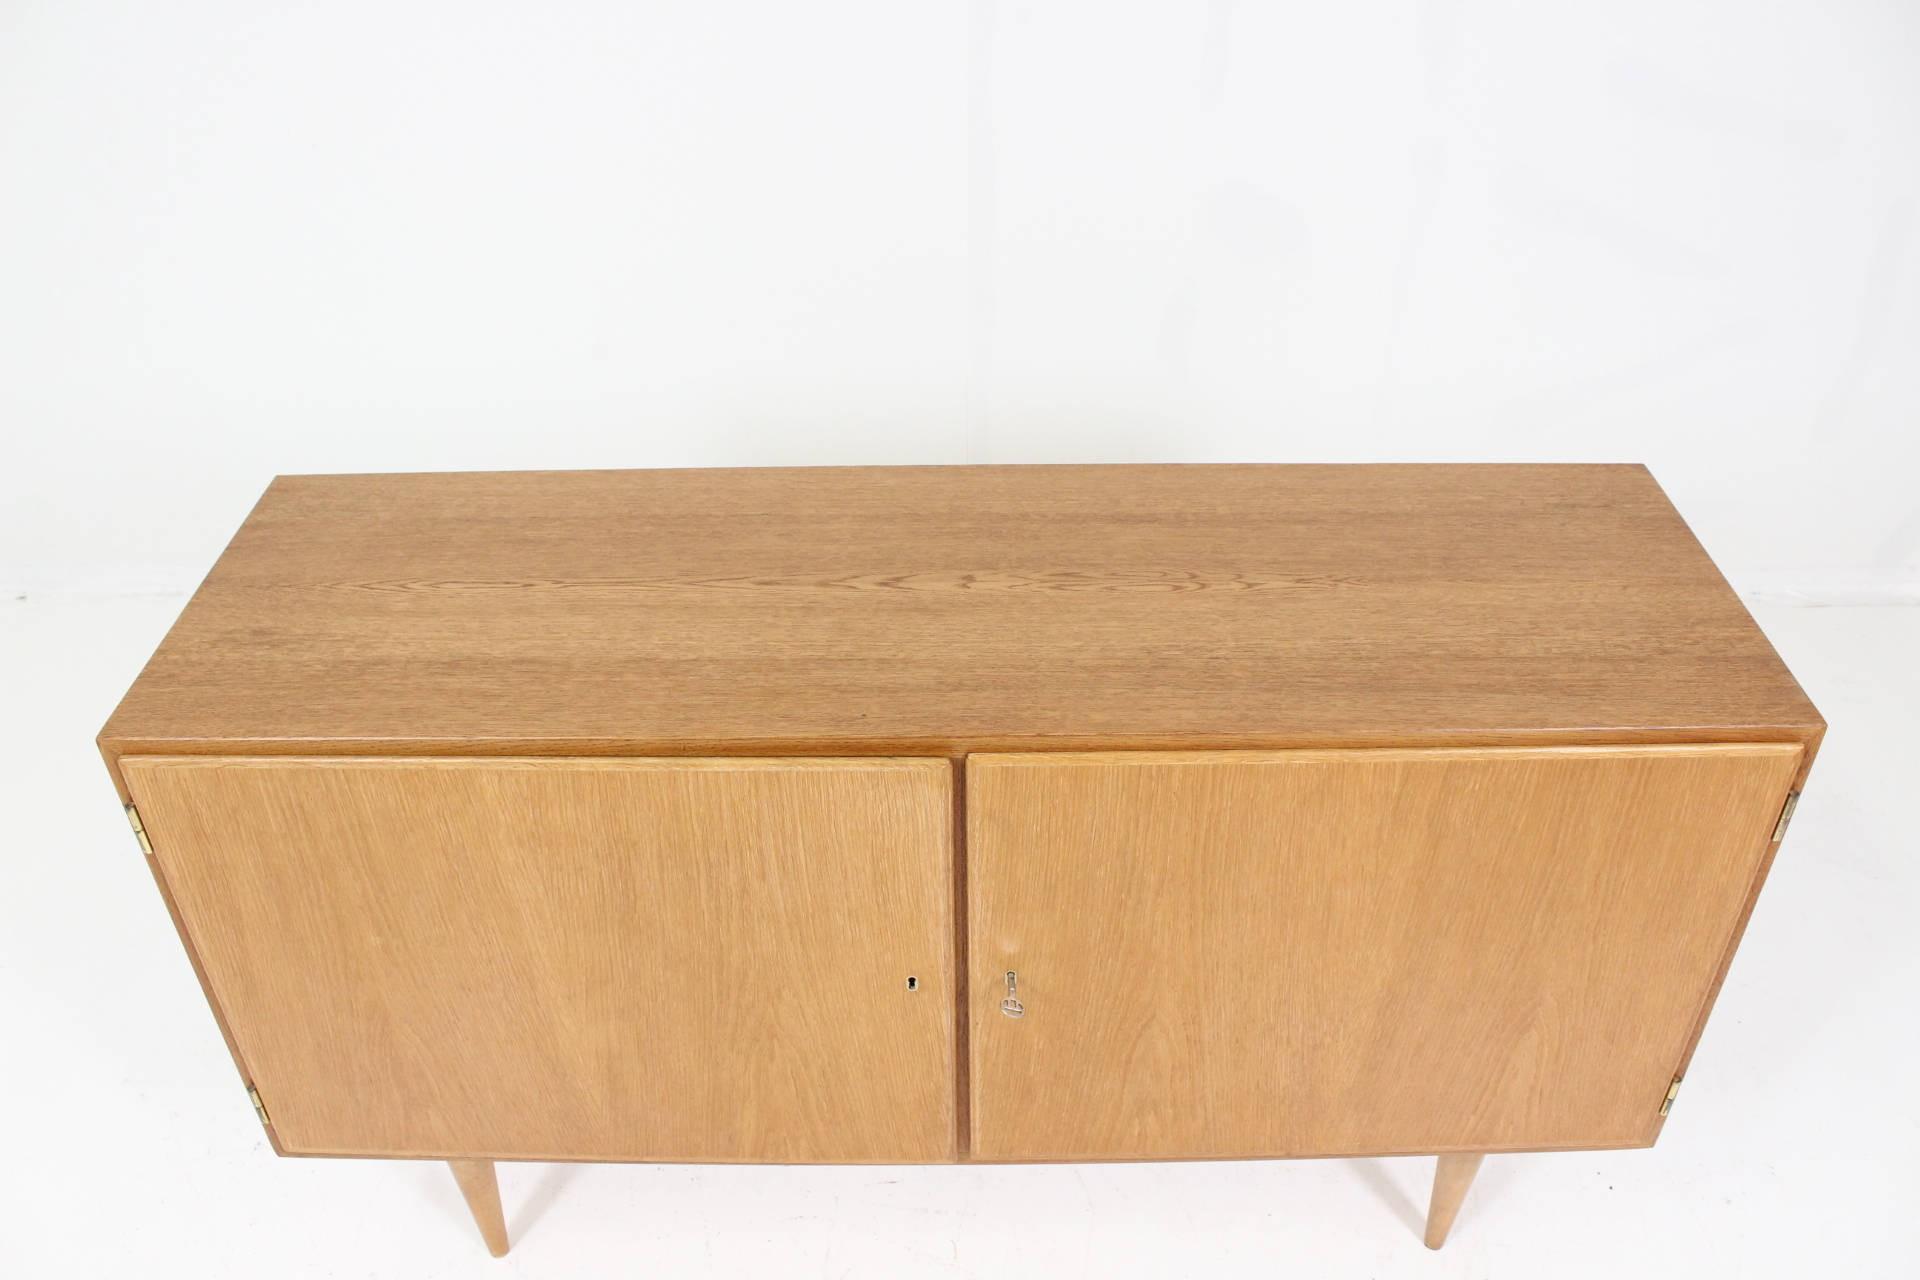 Hundevad Co Hu 40 3 Sideboard Carlo Jensen 1960s Design  # Meuble Tv Carlo